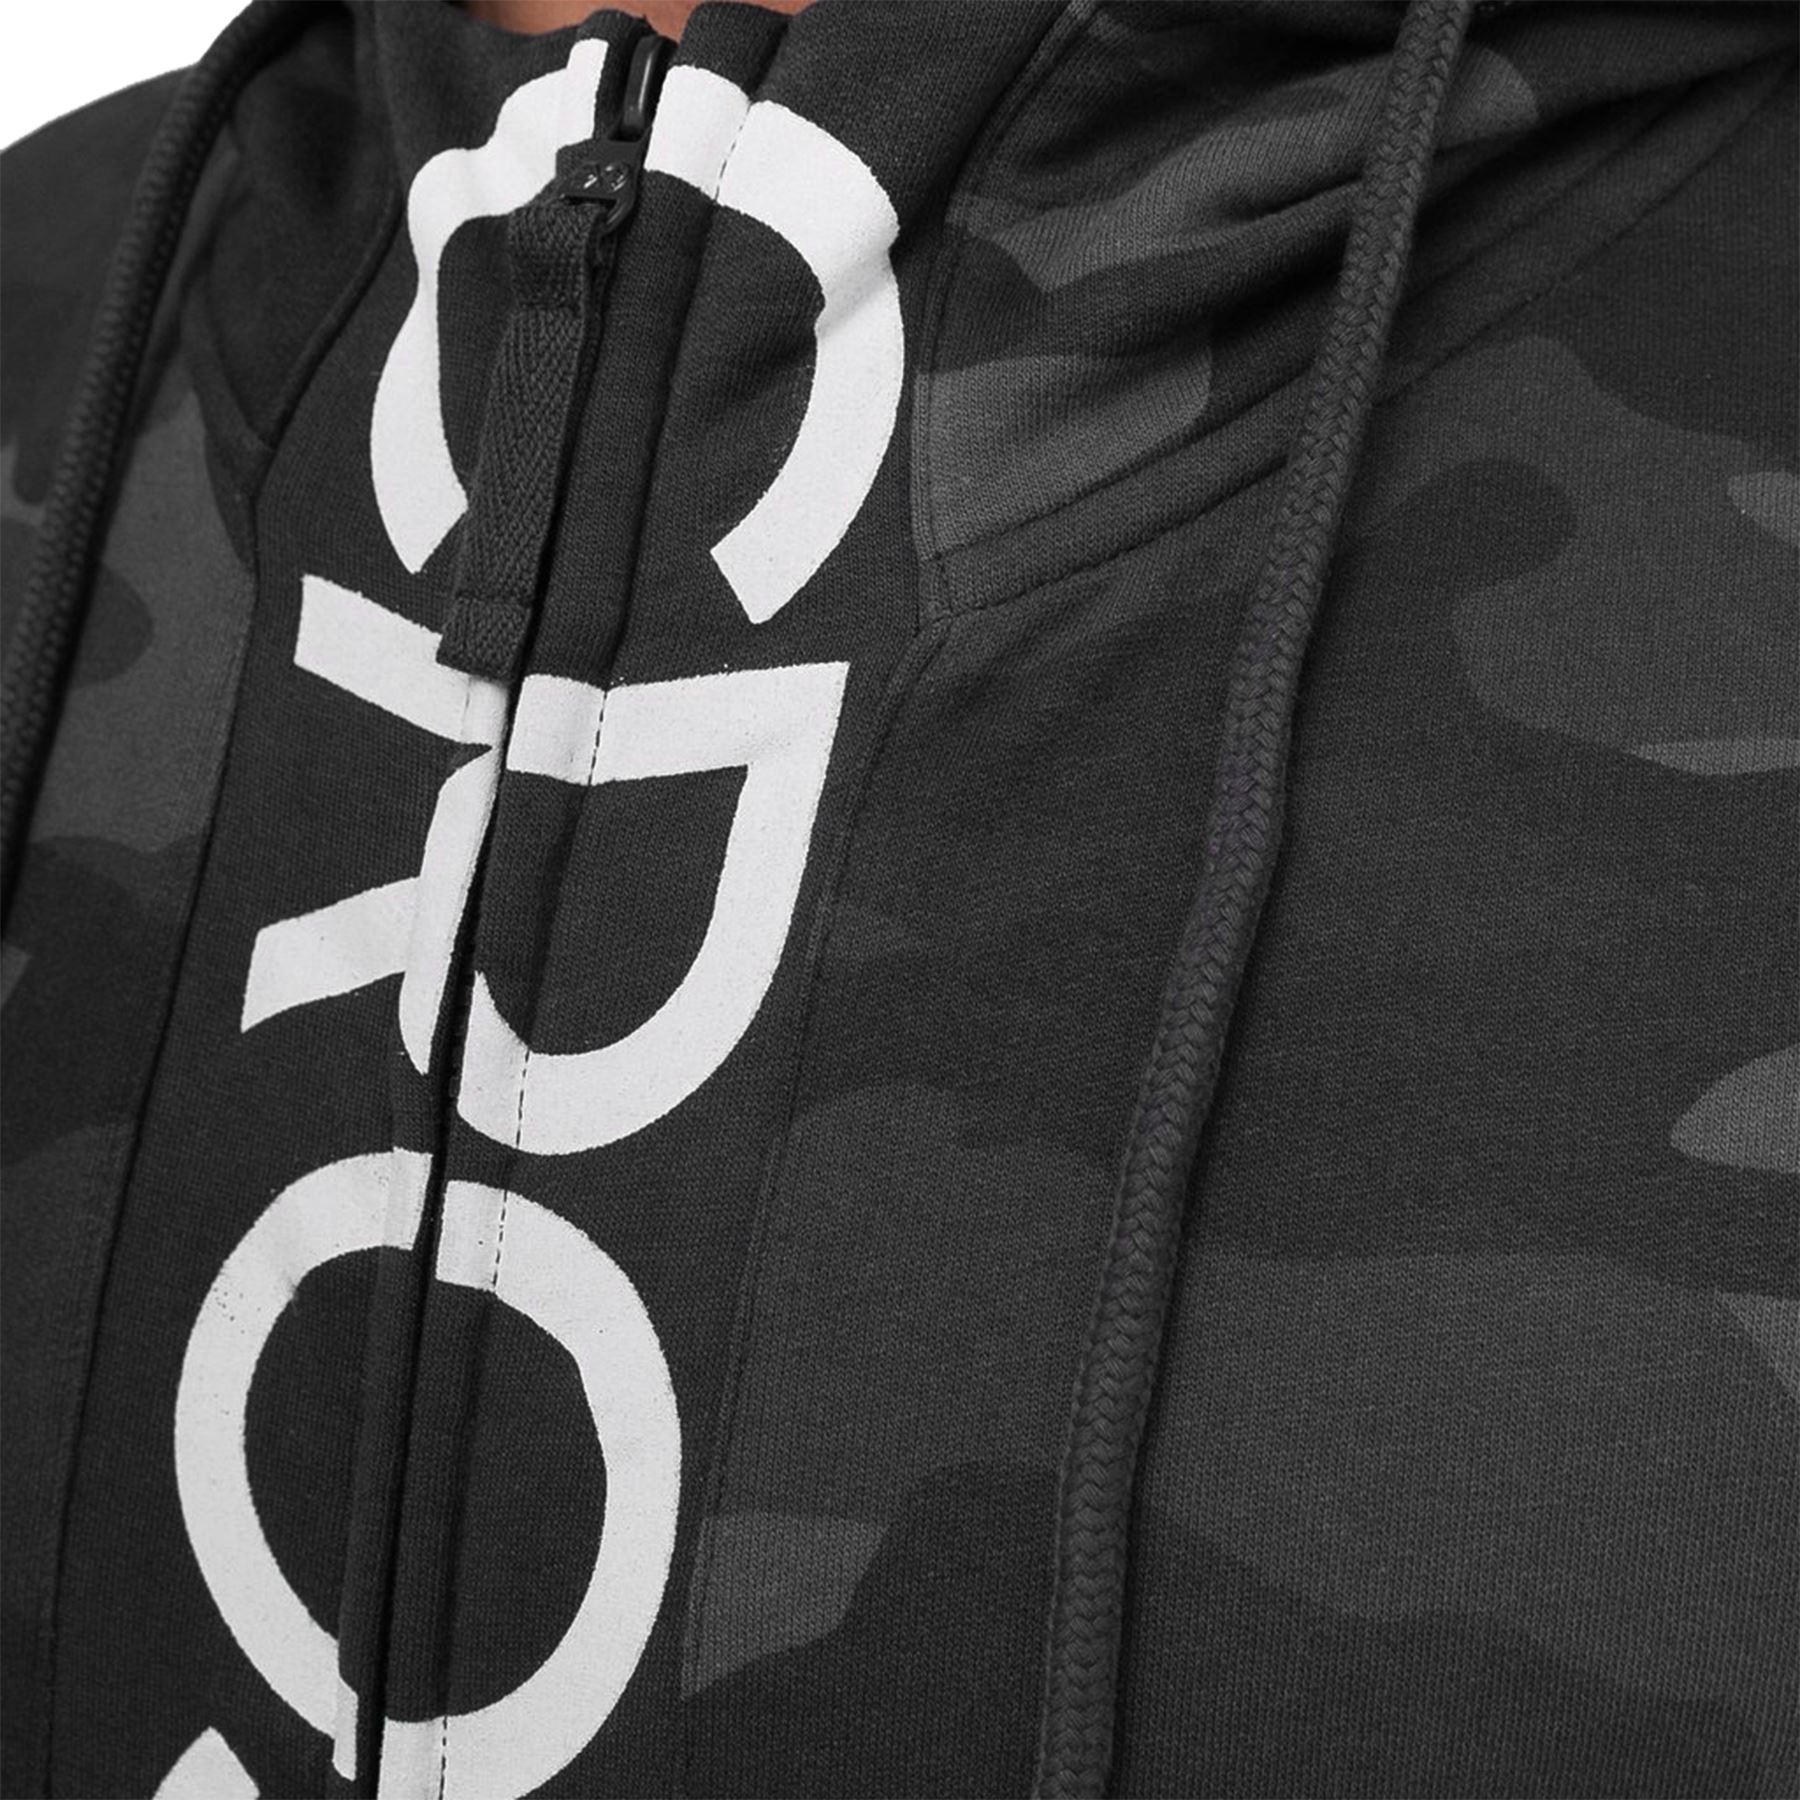 Crosshatch-Mens-Camo-Hoodie-Designer-Army-Style-Jacket-Zip-Thru-Pocket-Jacket thumbnail 10